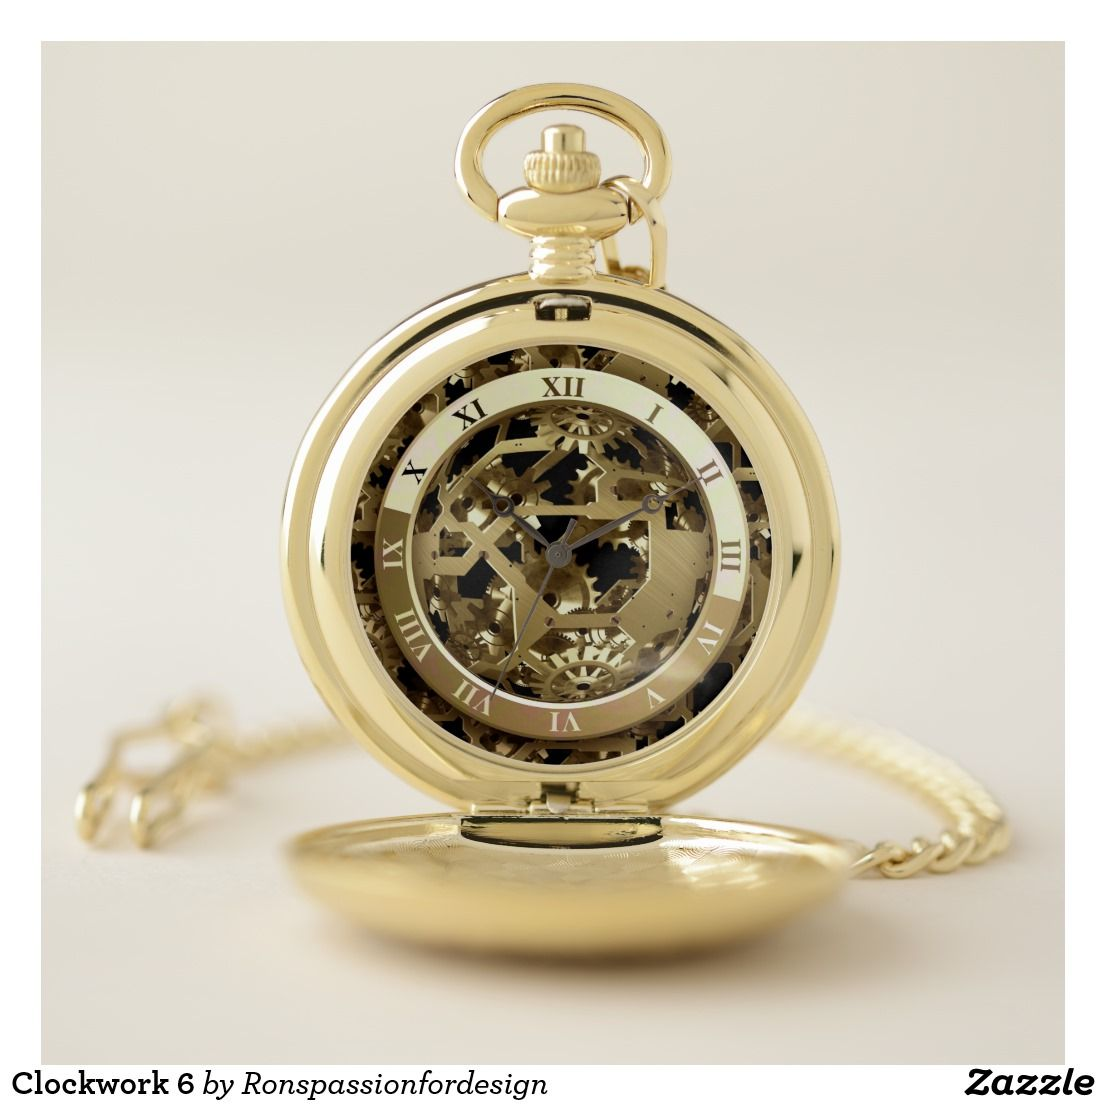 Clockwork 6 pocket watch Pocket watch